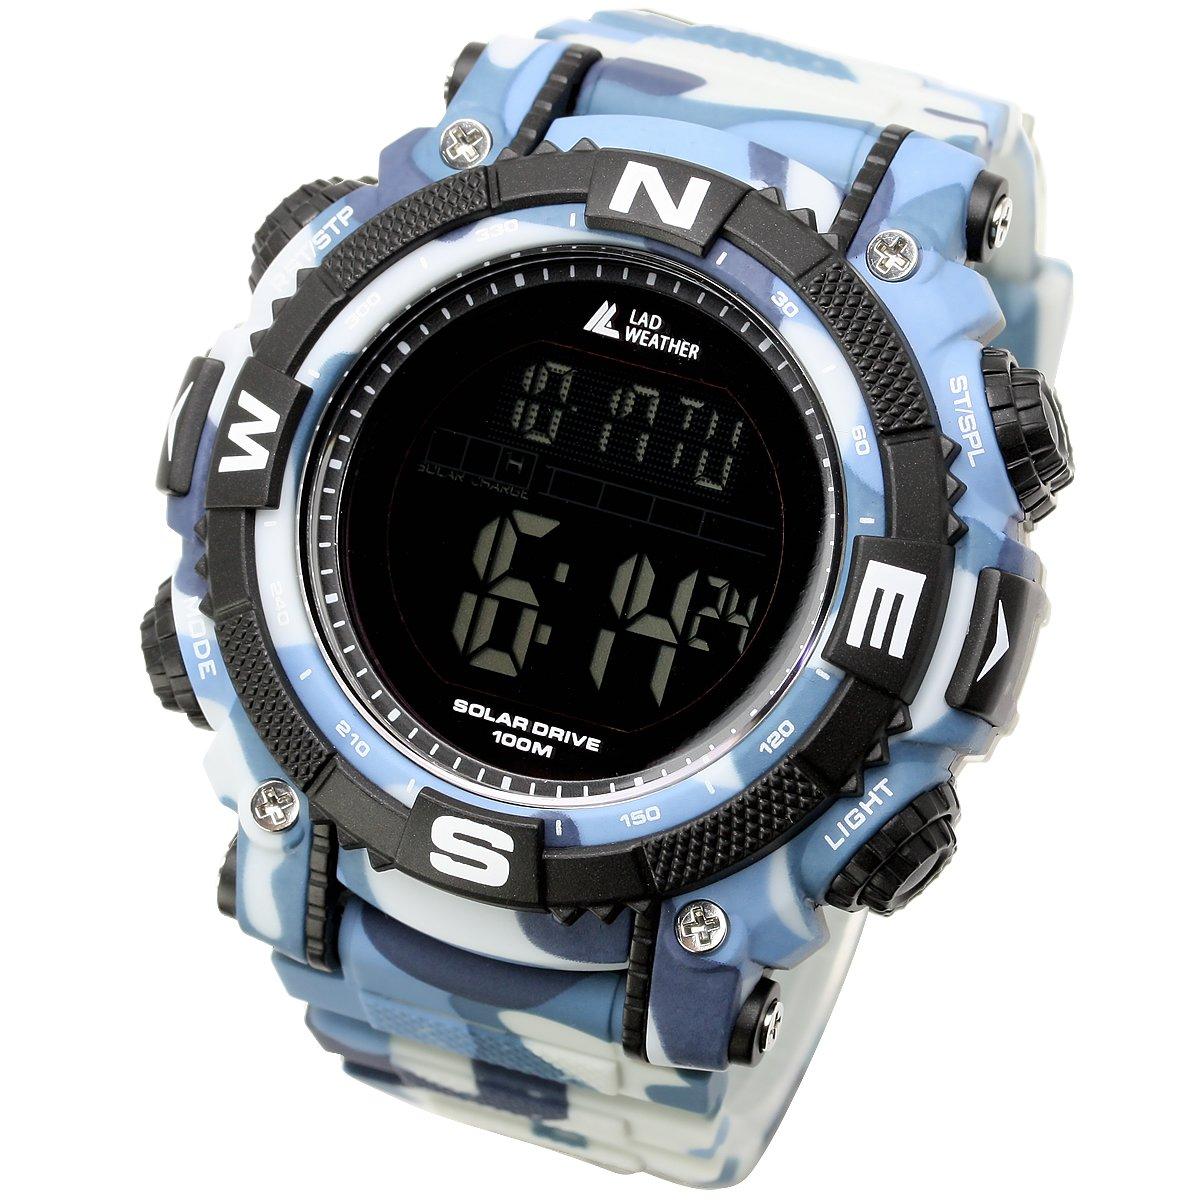 [Lad Weather] energía Solar Digital reloj Militar camuflaje impreso 100metros resistente al agua